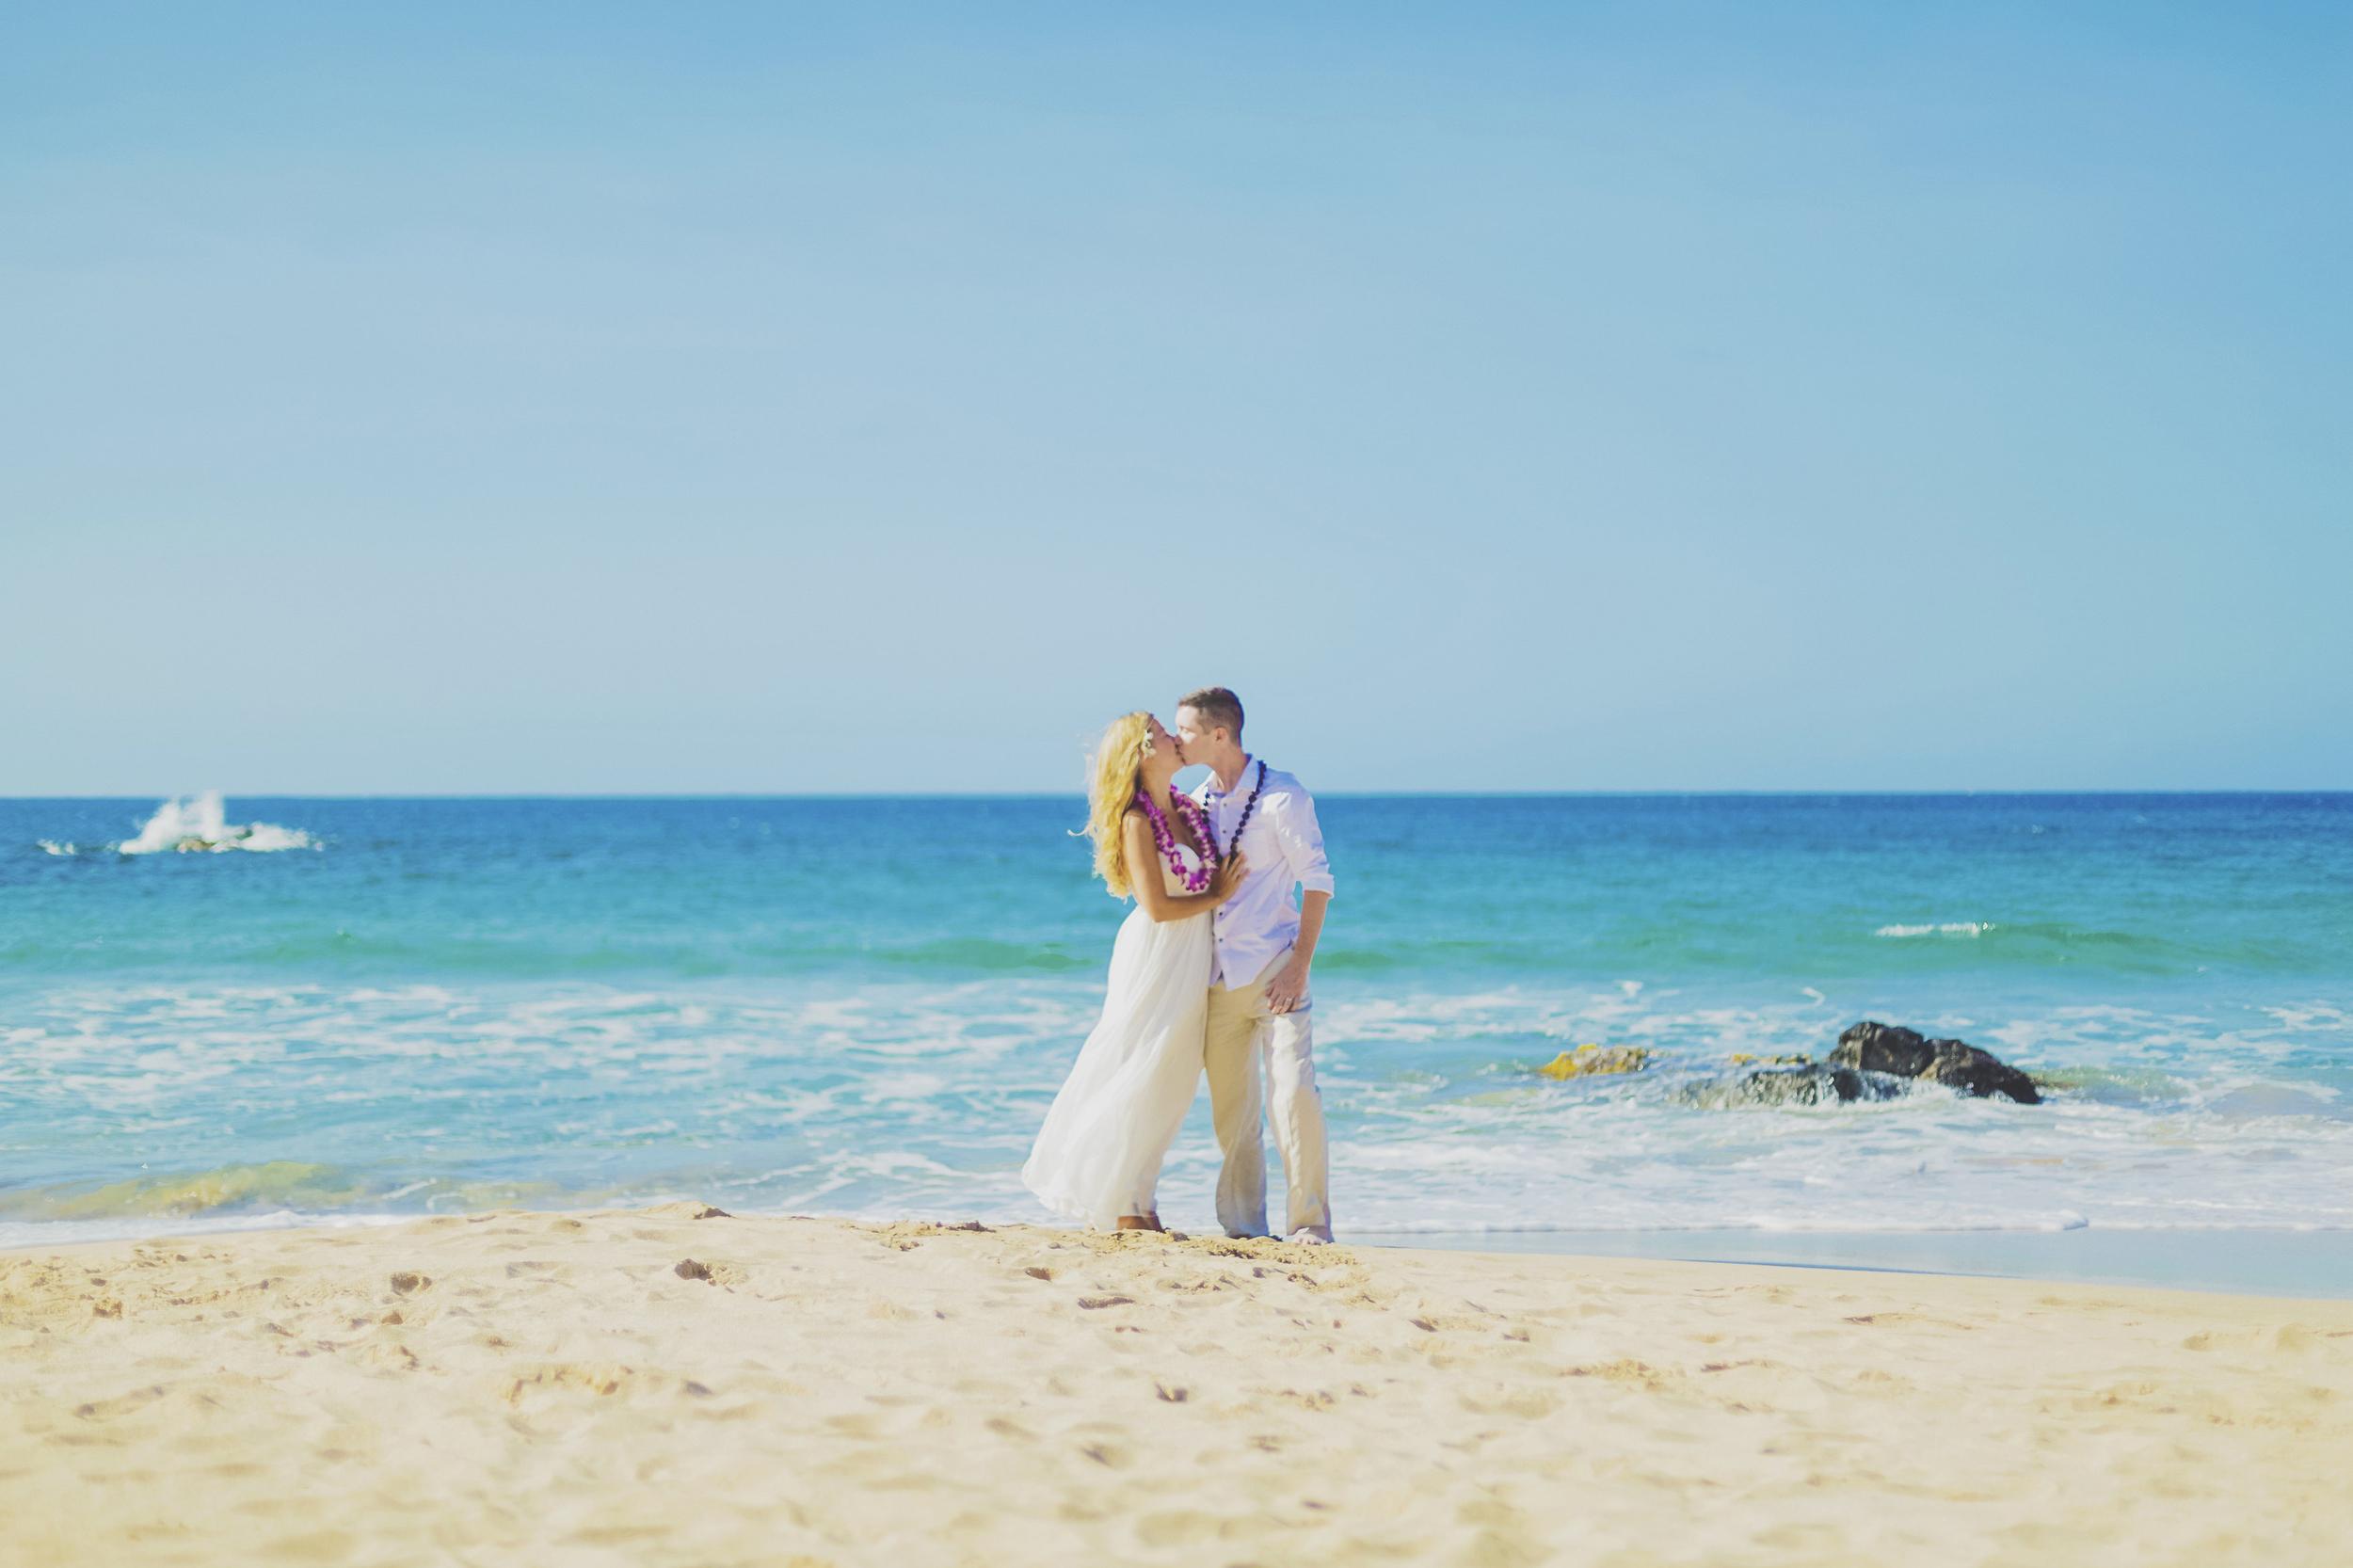 angie-diaz-photography-maui-honeymoon-hawaii-elopement-6.jpg